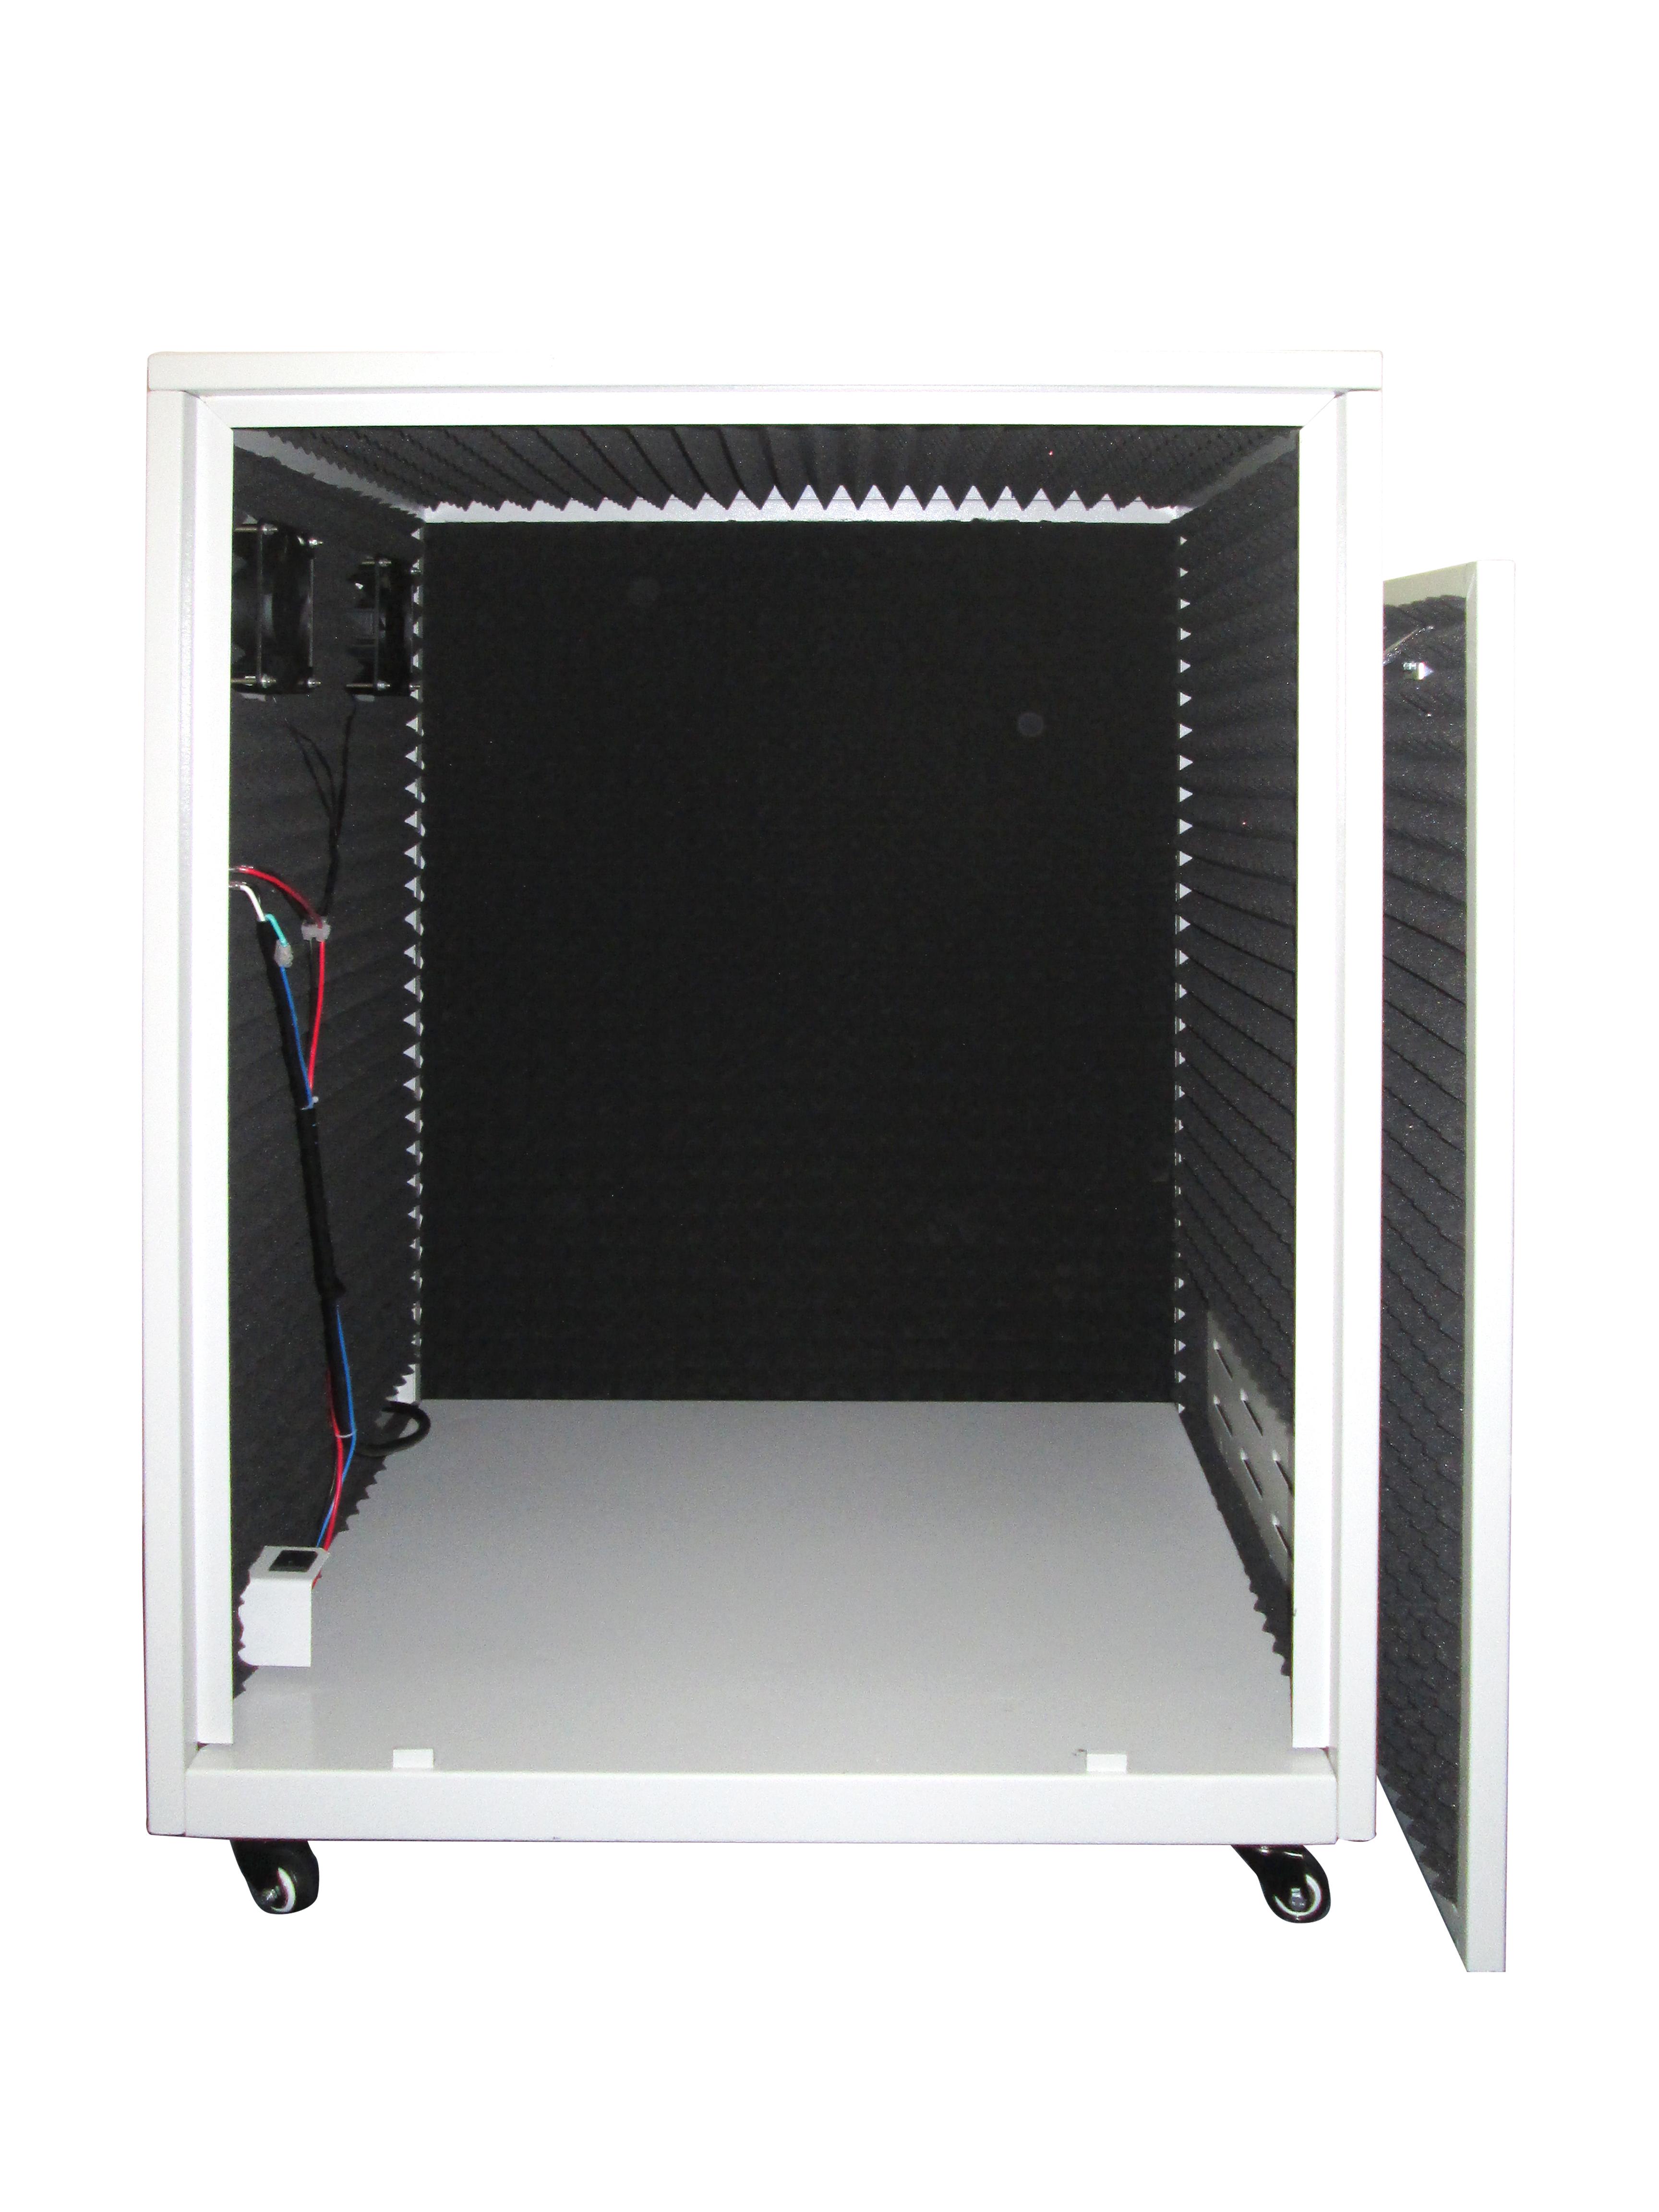 California Air Tools SPC03 Air Compressor Sound Proof Cabinet PartNumber: 00949228000P KsnValue: 8143801 MfgPartNumber: SPC03